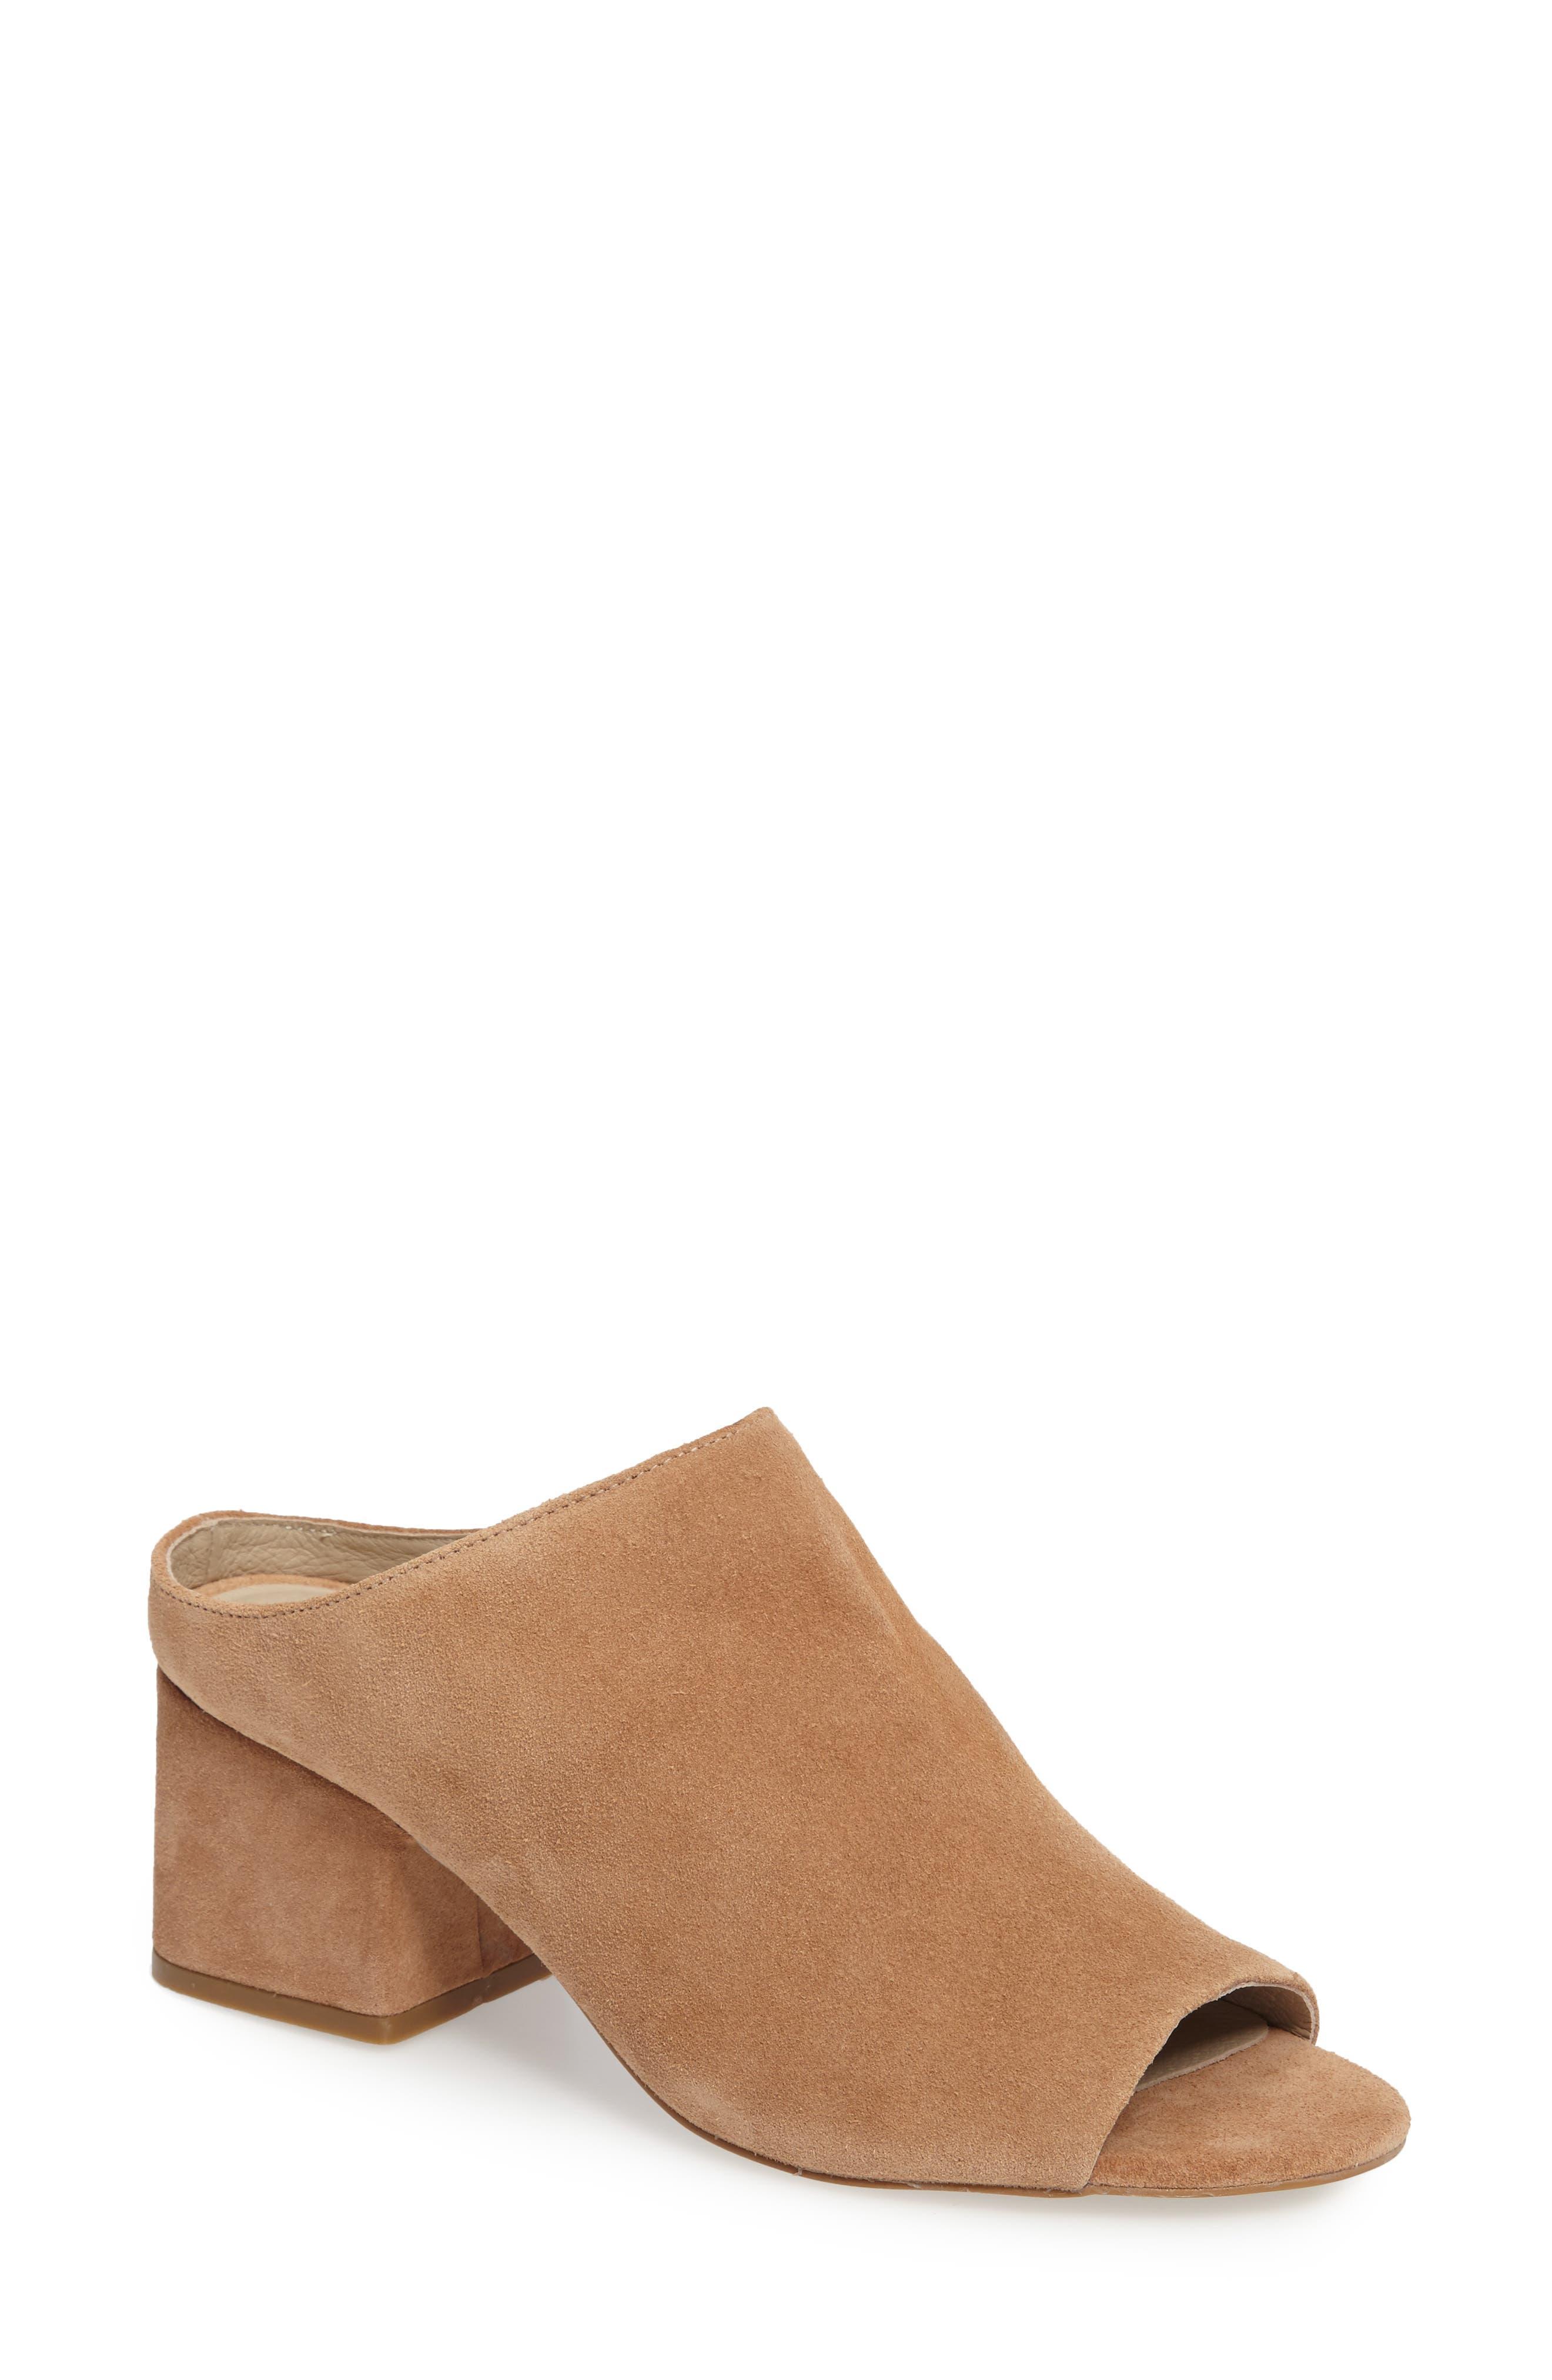 Main Image - Matisse Misty Block Heel Mule (Women)